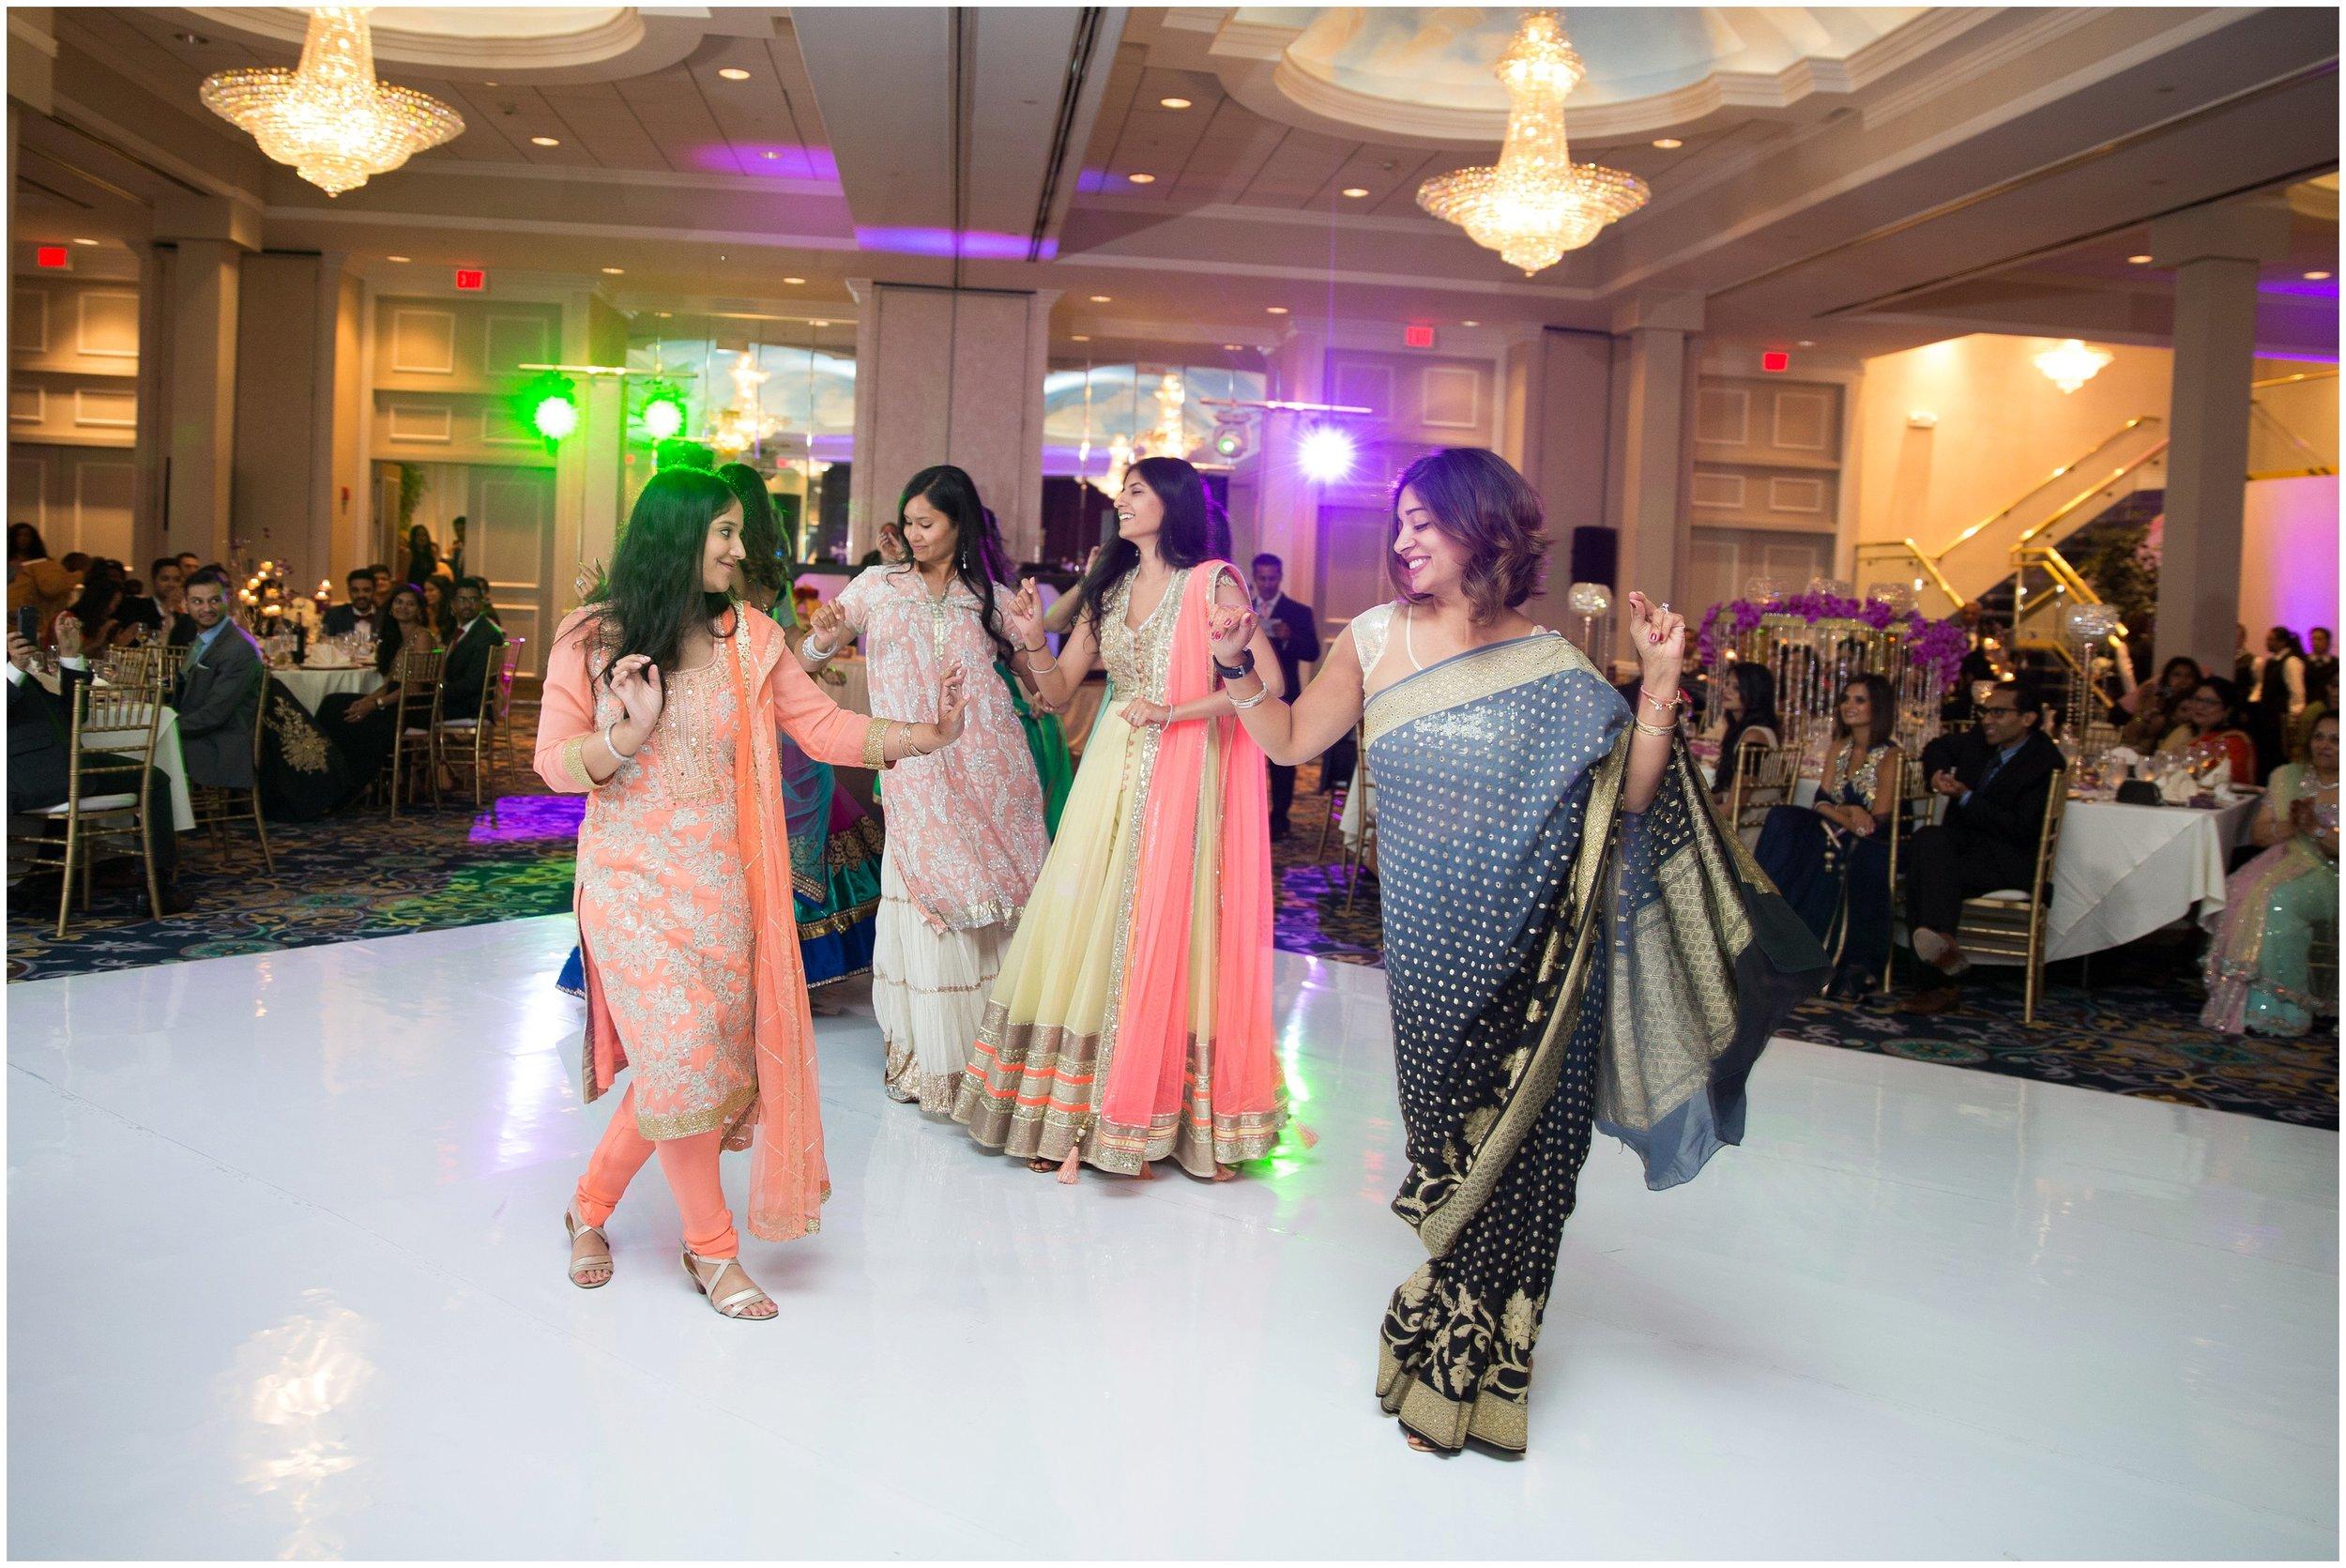 Le Cape Weddings - South Asian Wedding in Illinois - Tanvi and Anshul -1891_LuxuryDestinationPhotographer.jpg